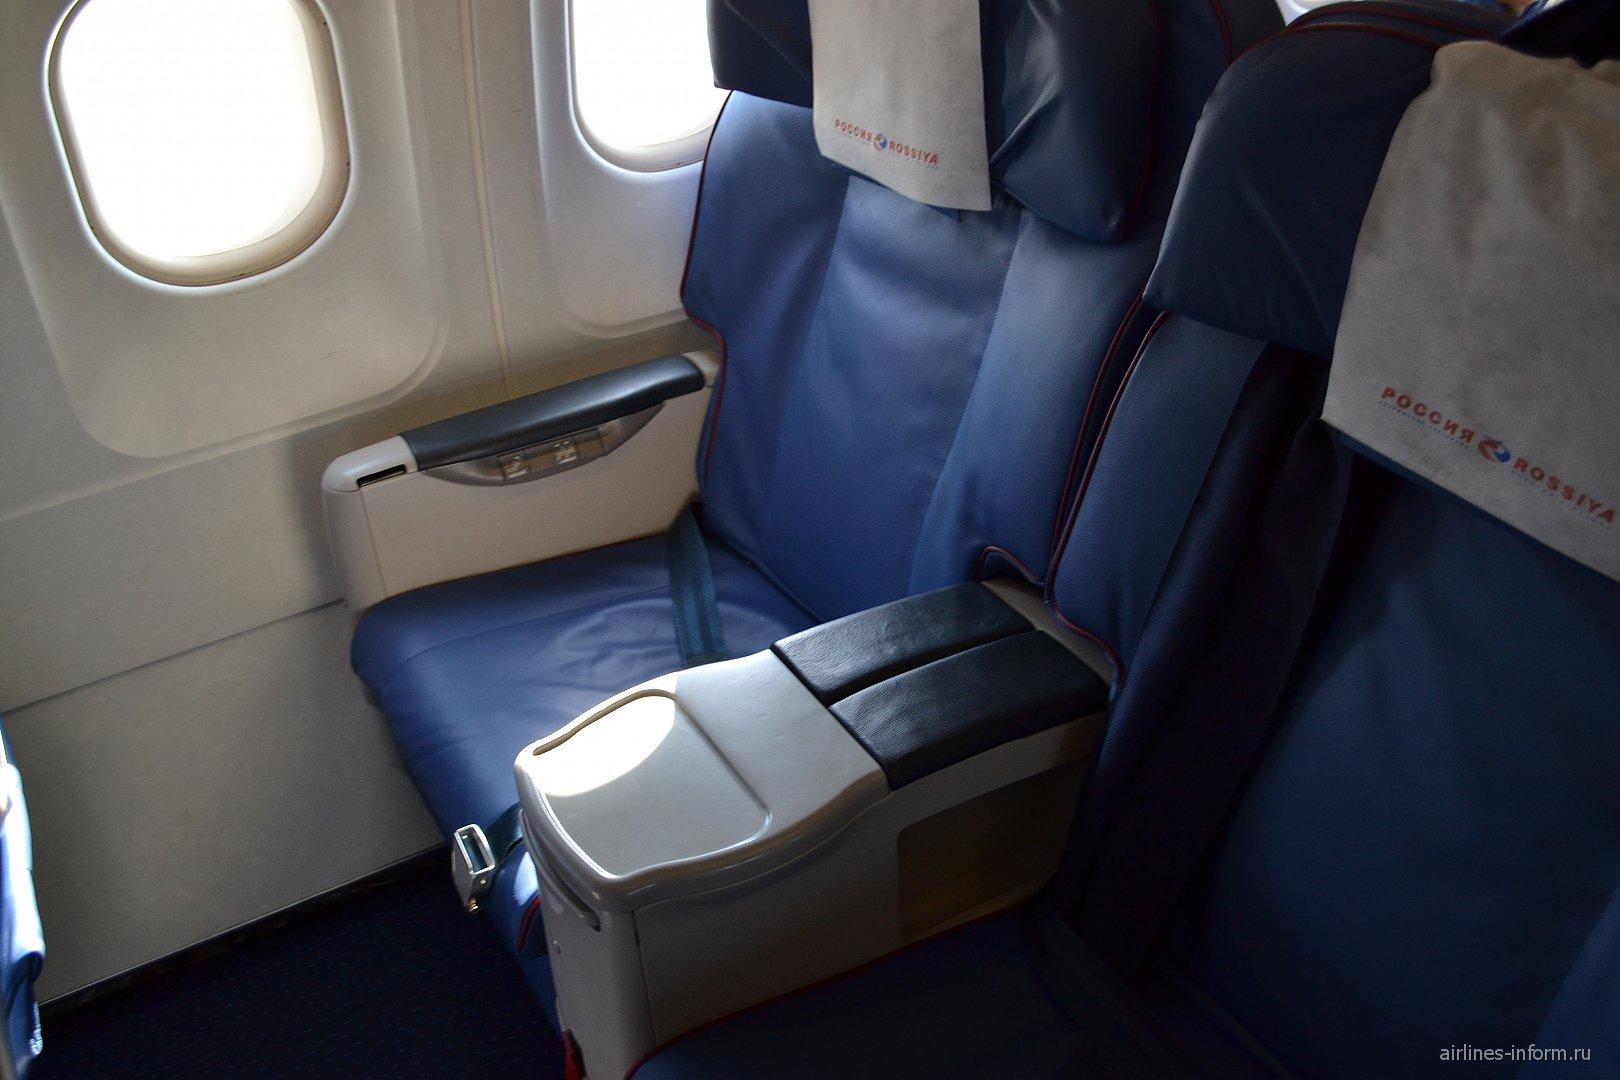 Кресла бизнес-класса самолета Airbus A319 авиакомпании